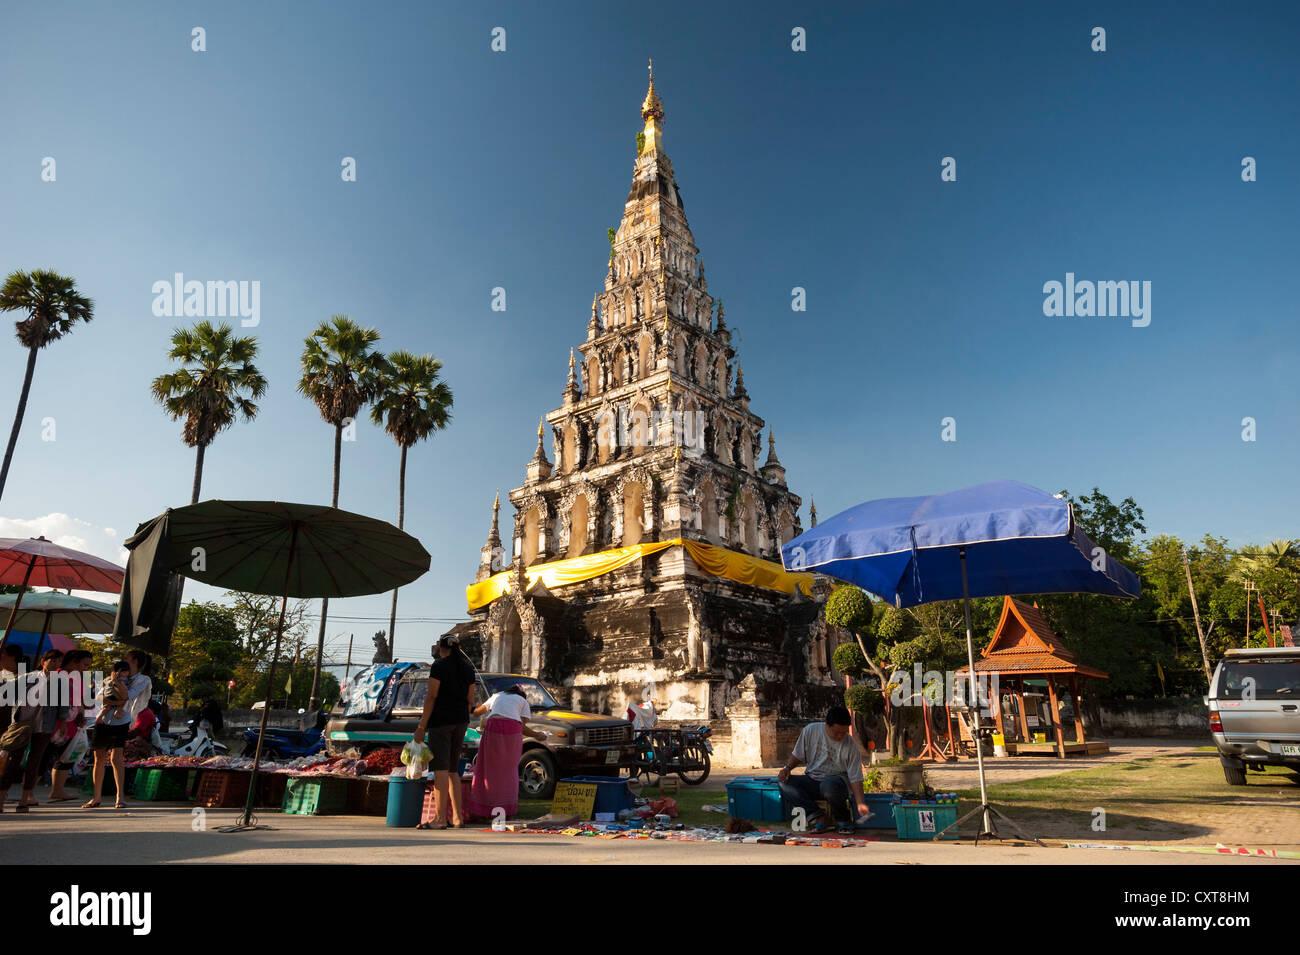 Square Pagoda inhabituelle ou chedi, Wat Chedi Liam et marché, restauré Wiang Kum Kam settlement, Chiang Photo Stock